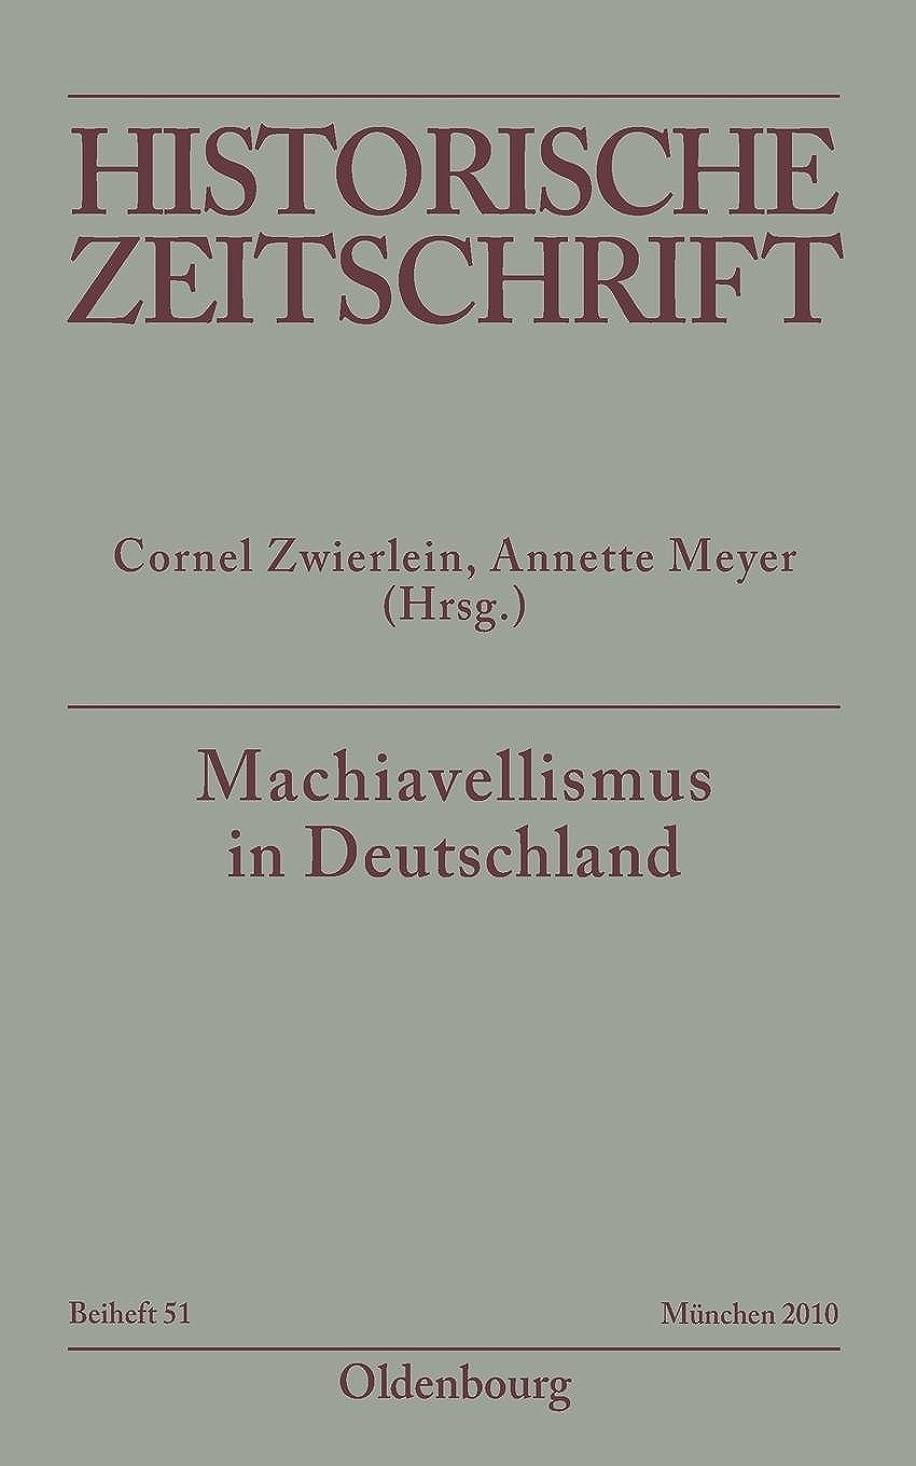 血まみれのストラトフォードオンエイボン抽出Machiavellismus in Deutschland: Chiffre Von Kontingenz, Herrschaft Und Empirismus in Der Neuzeit (Historische Zeitschrift / Beihefte)